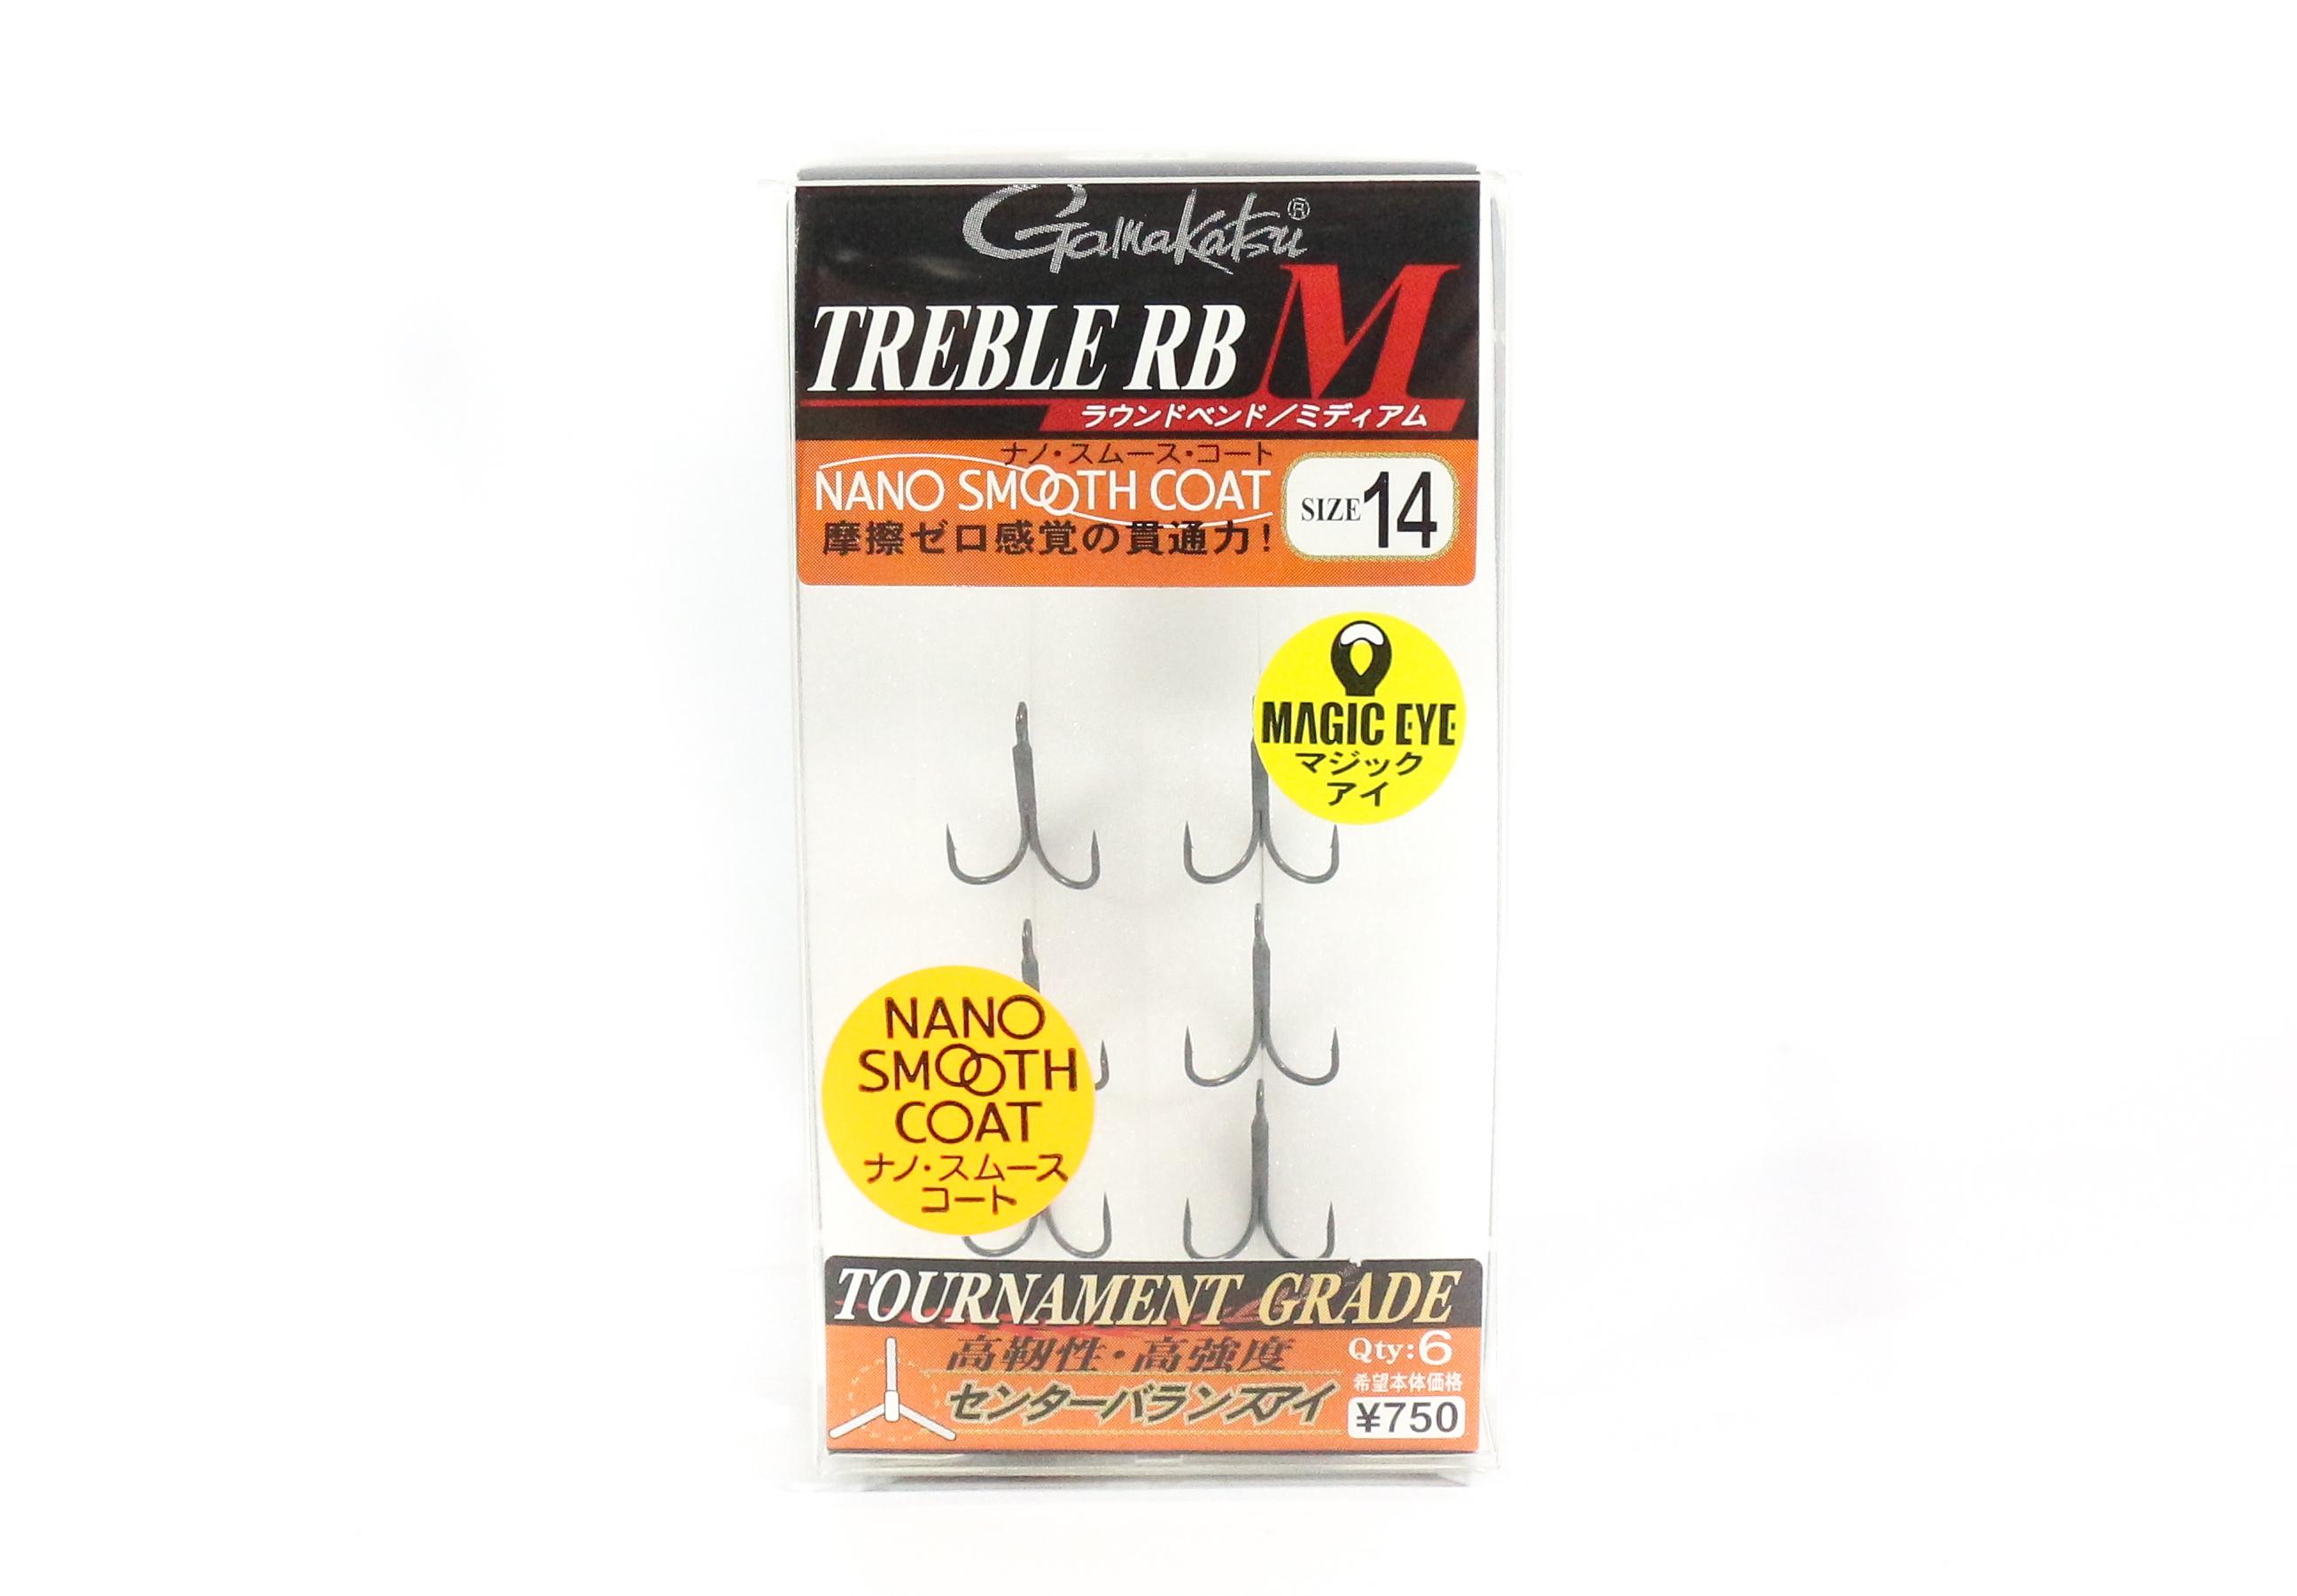 Gamakatsu Treble Hook RB M Nano Coat Size 14 (4608)